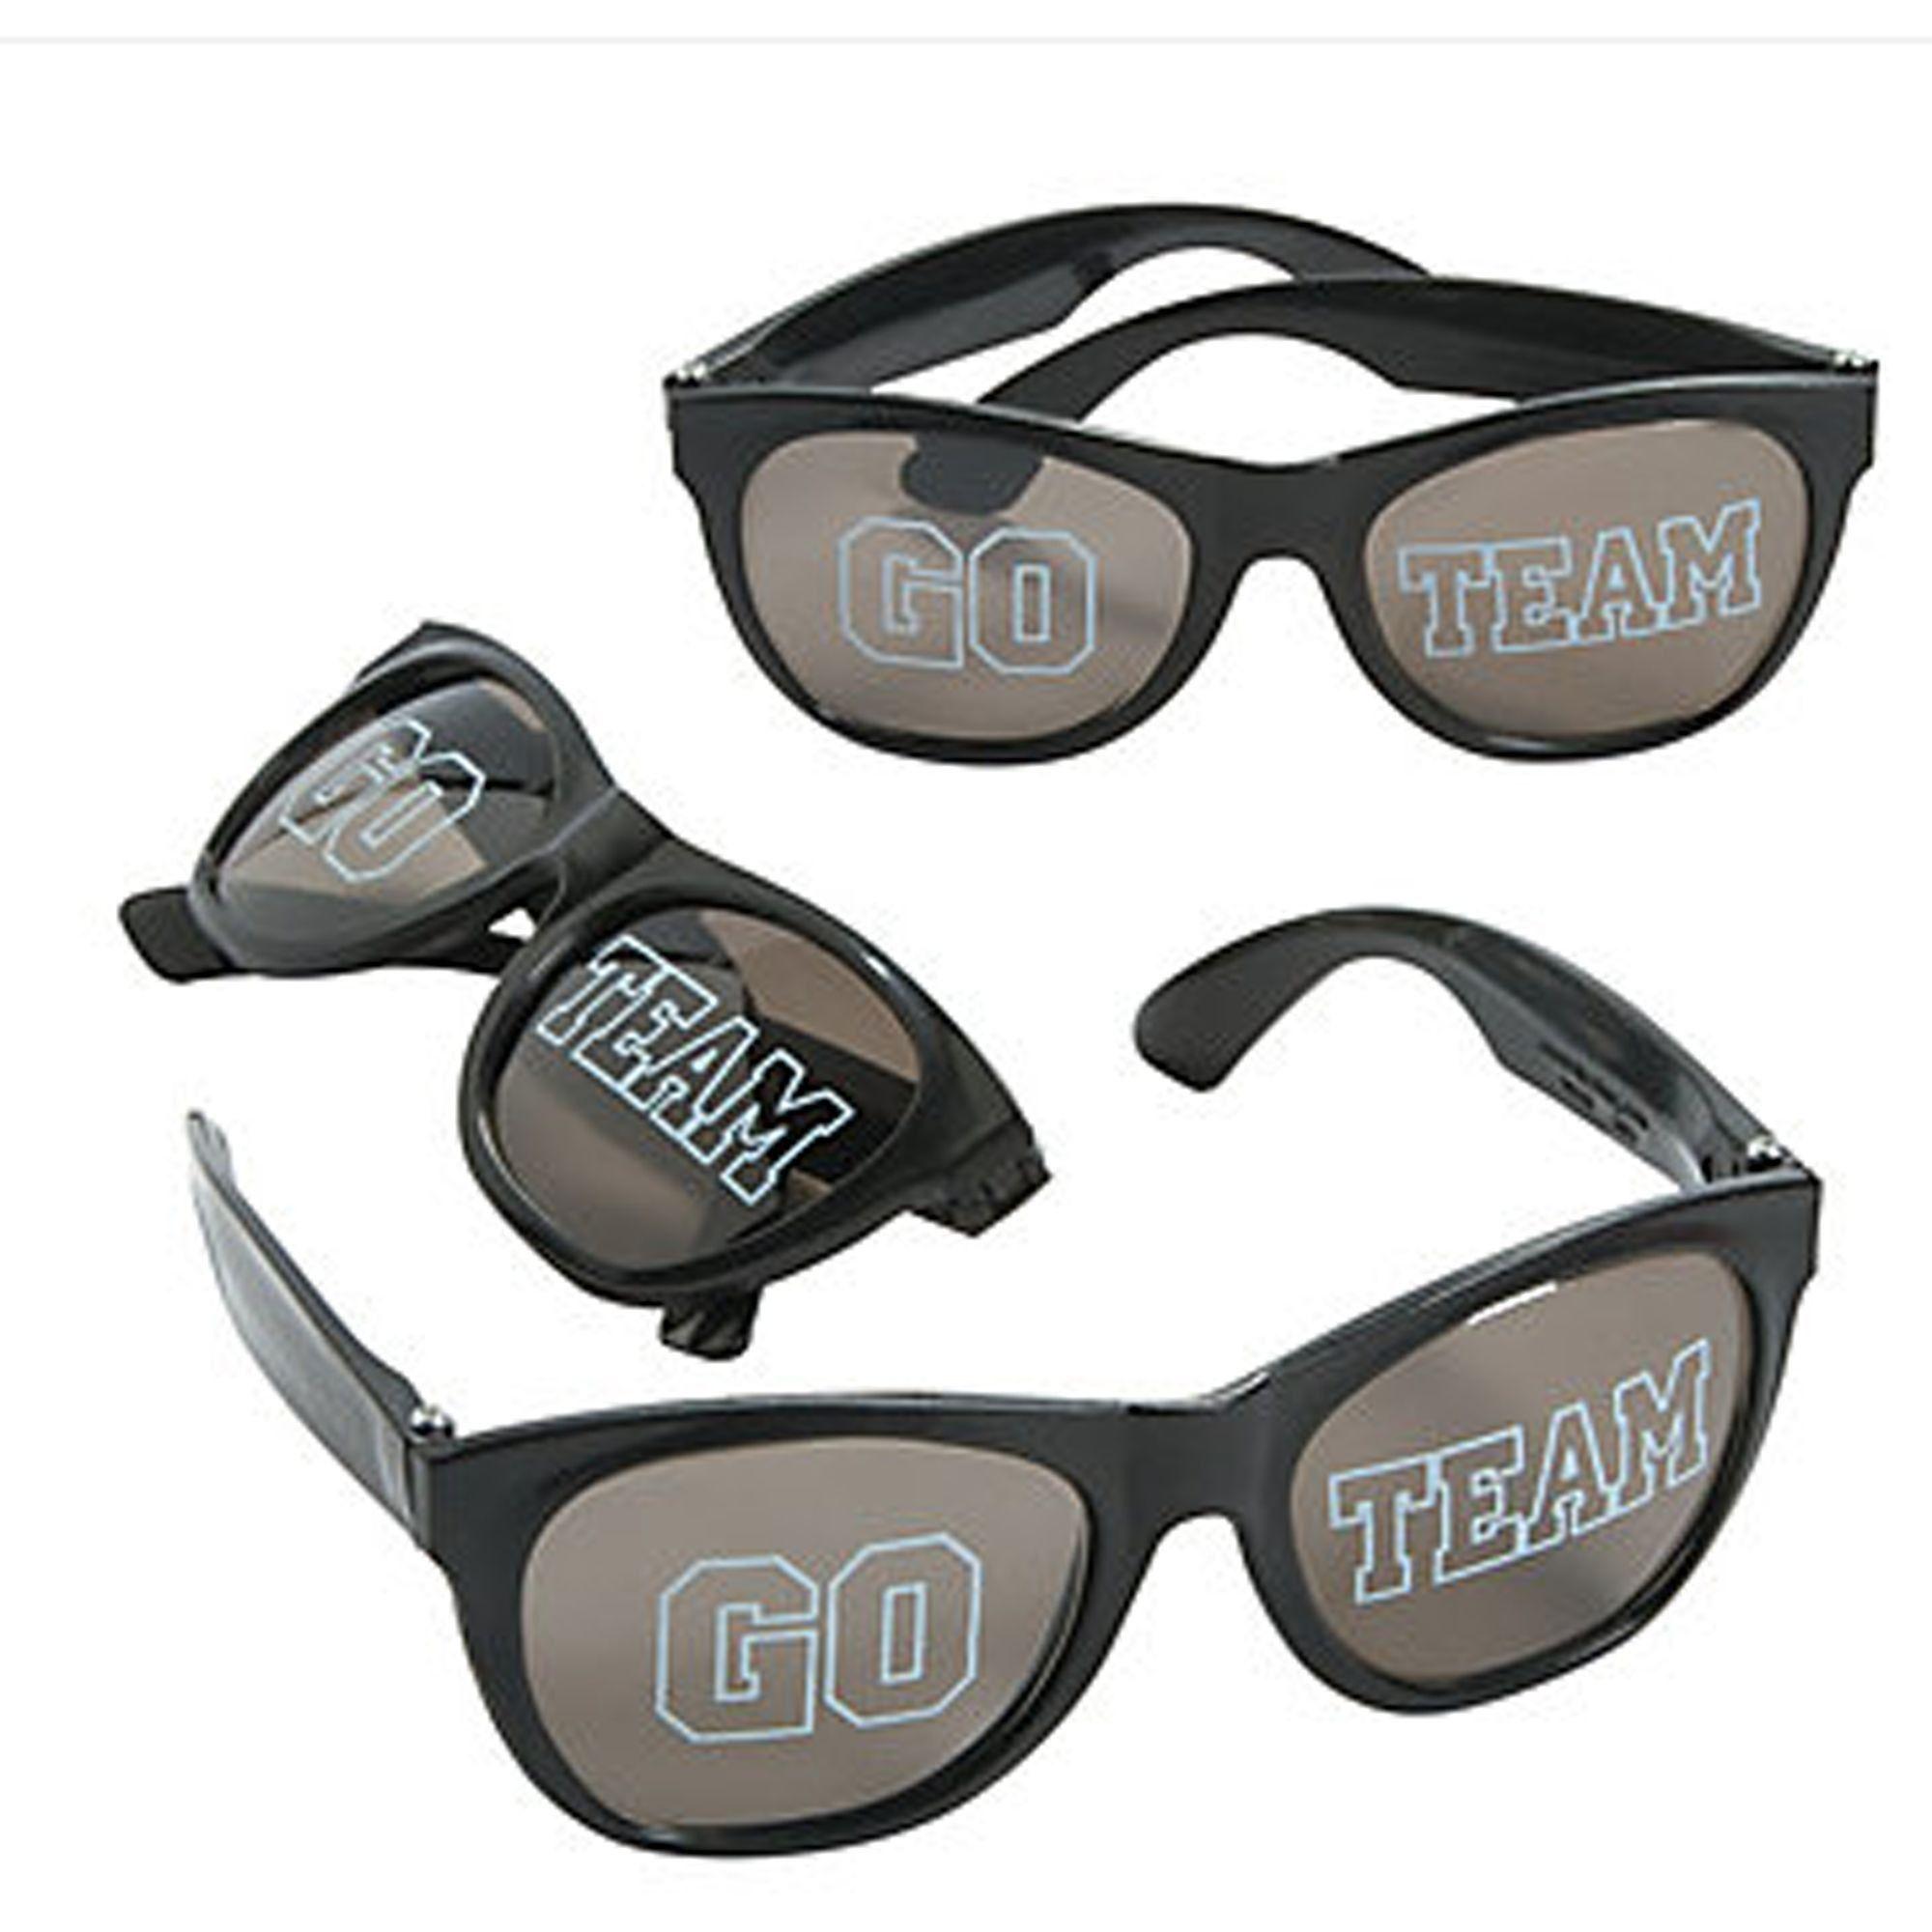 12 Go Team Black Sunglasses #13655831